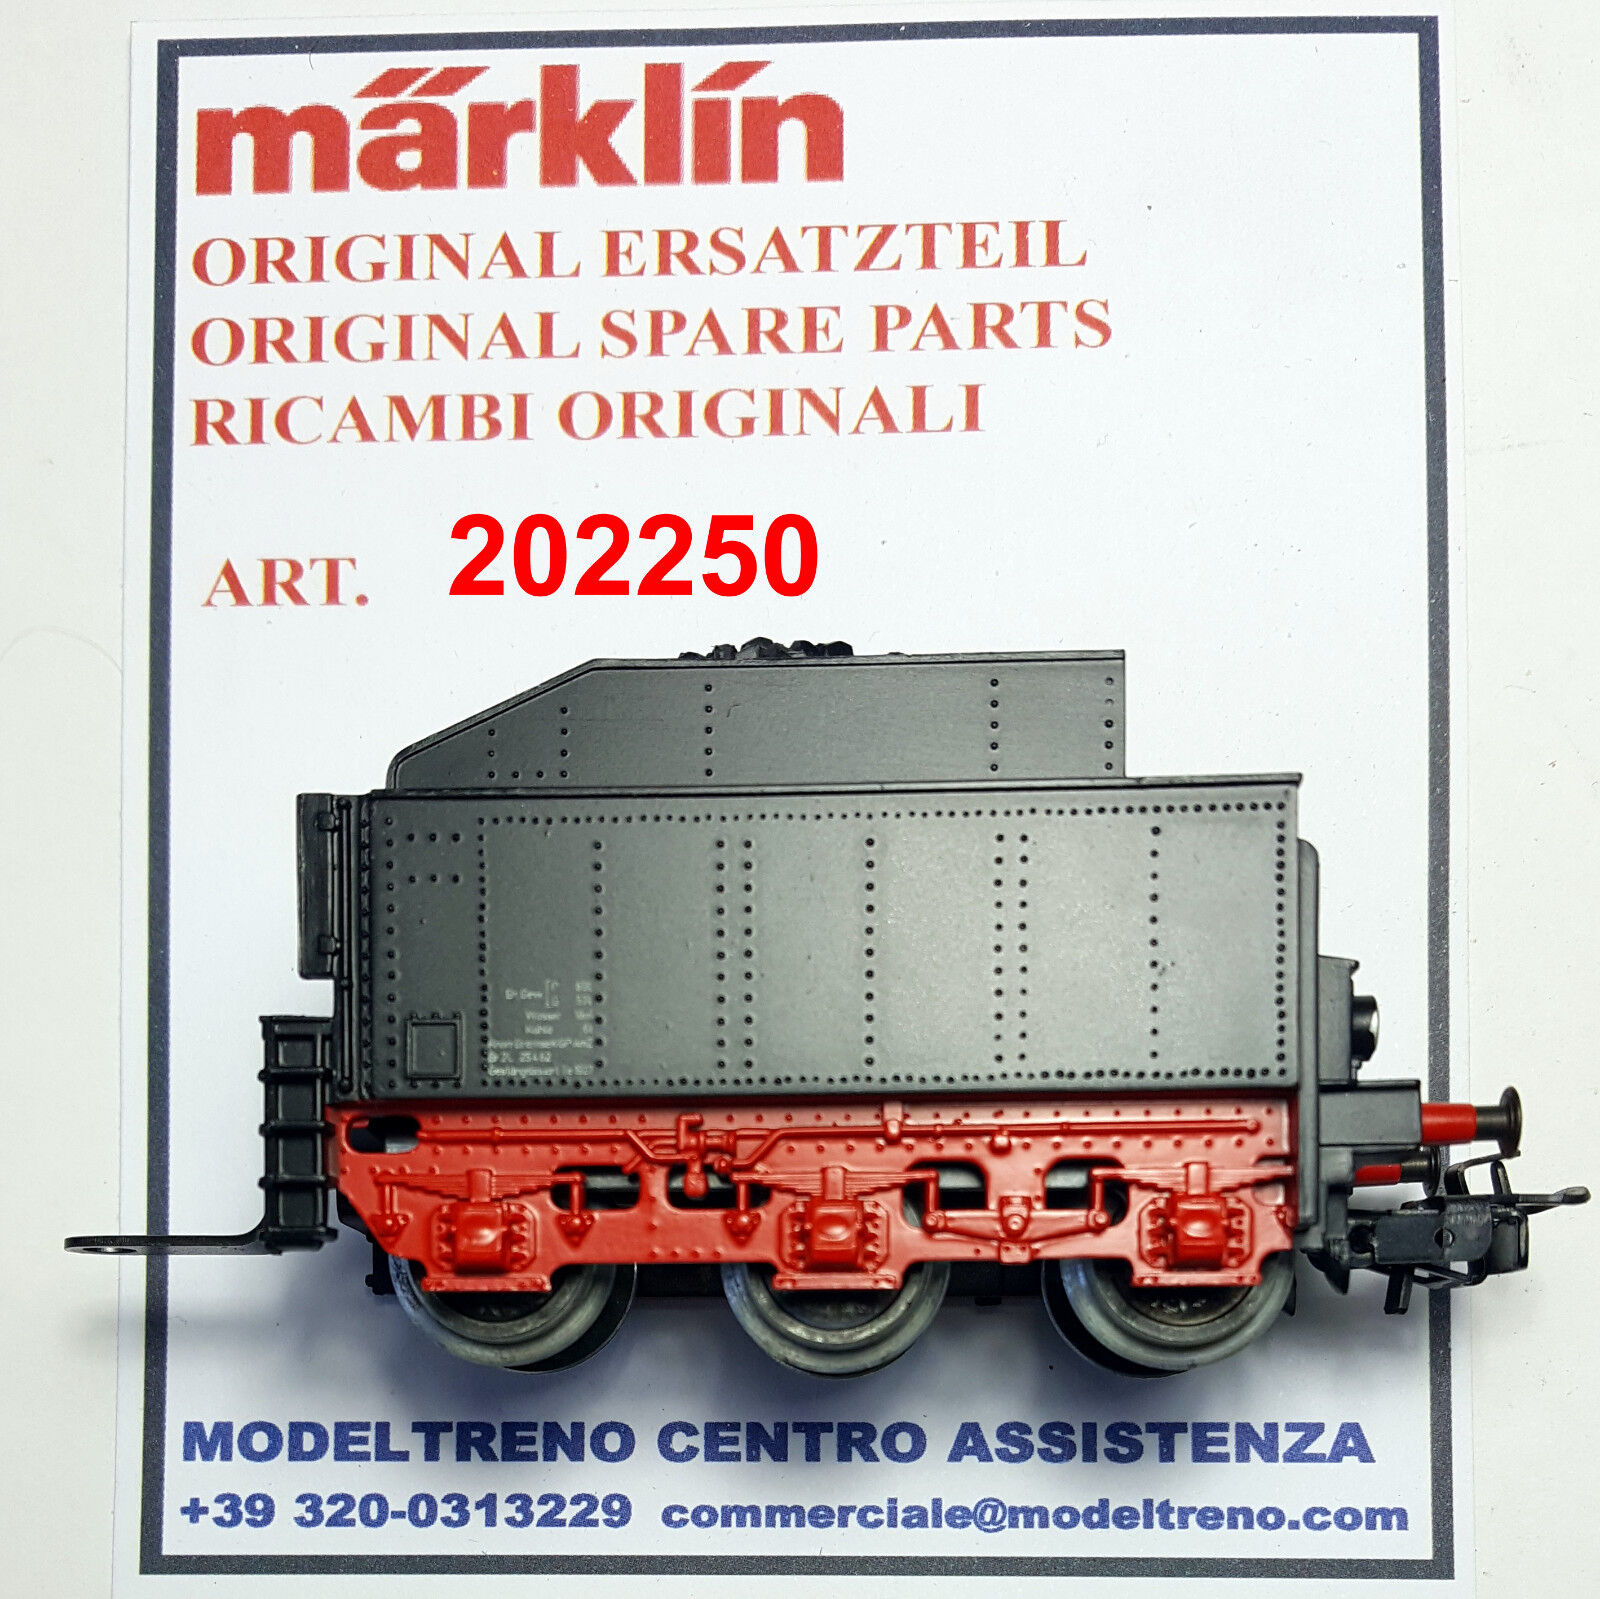 MARKLIN 20225 - 202250 TENDER COMPLETO - TENDER KOMPLETT  3003